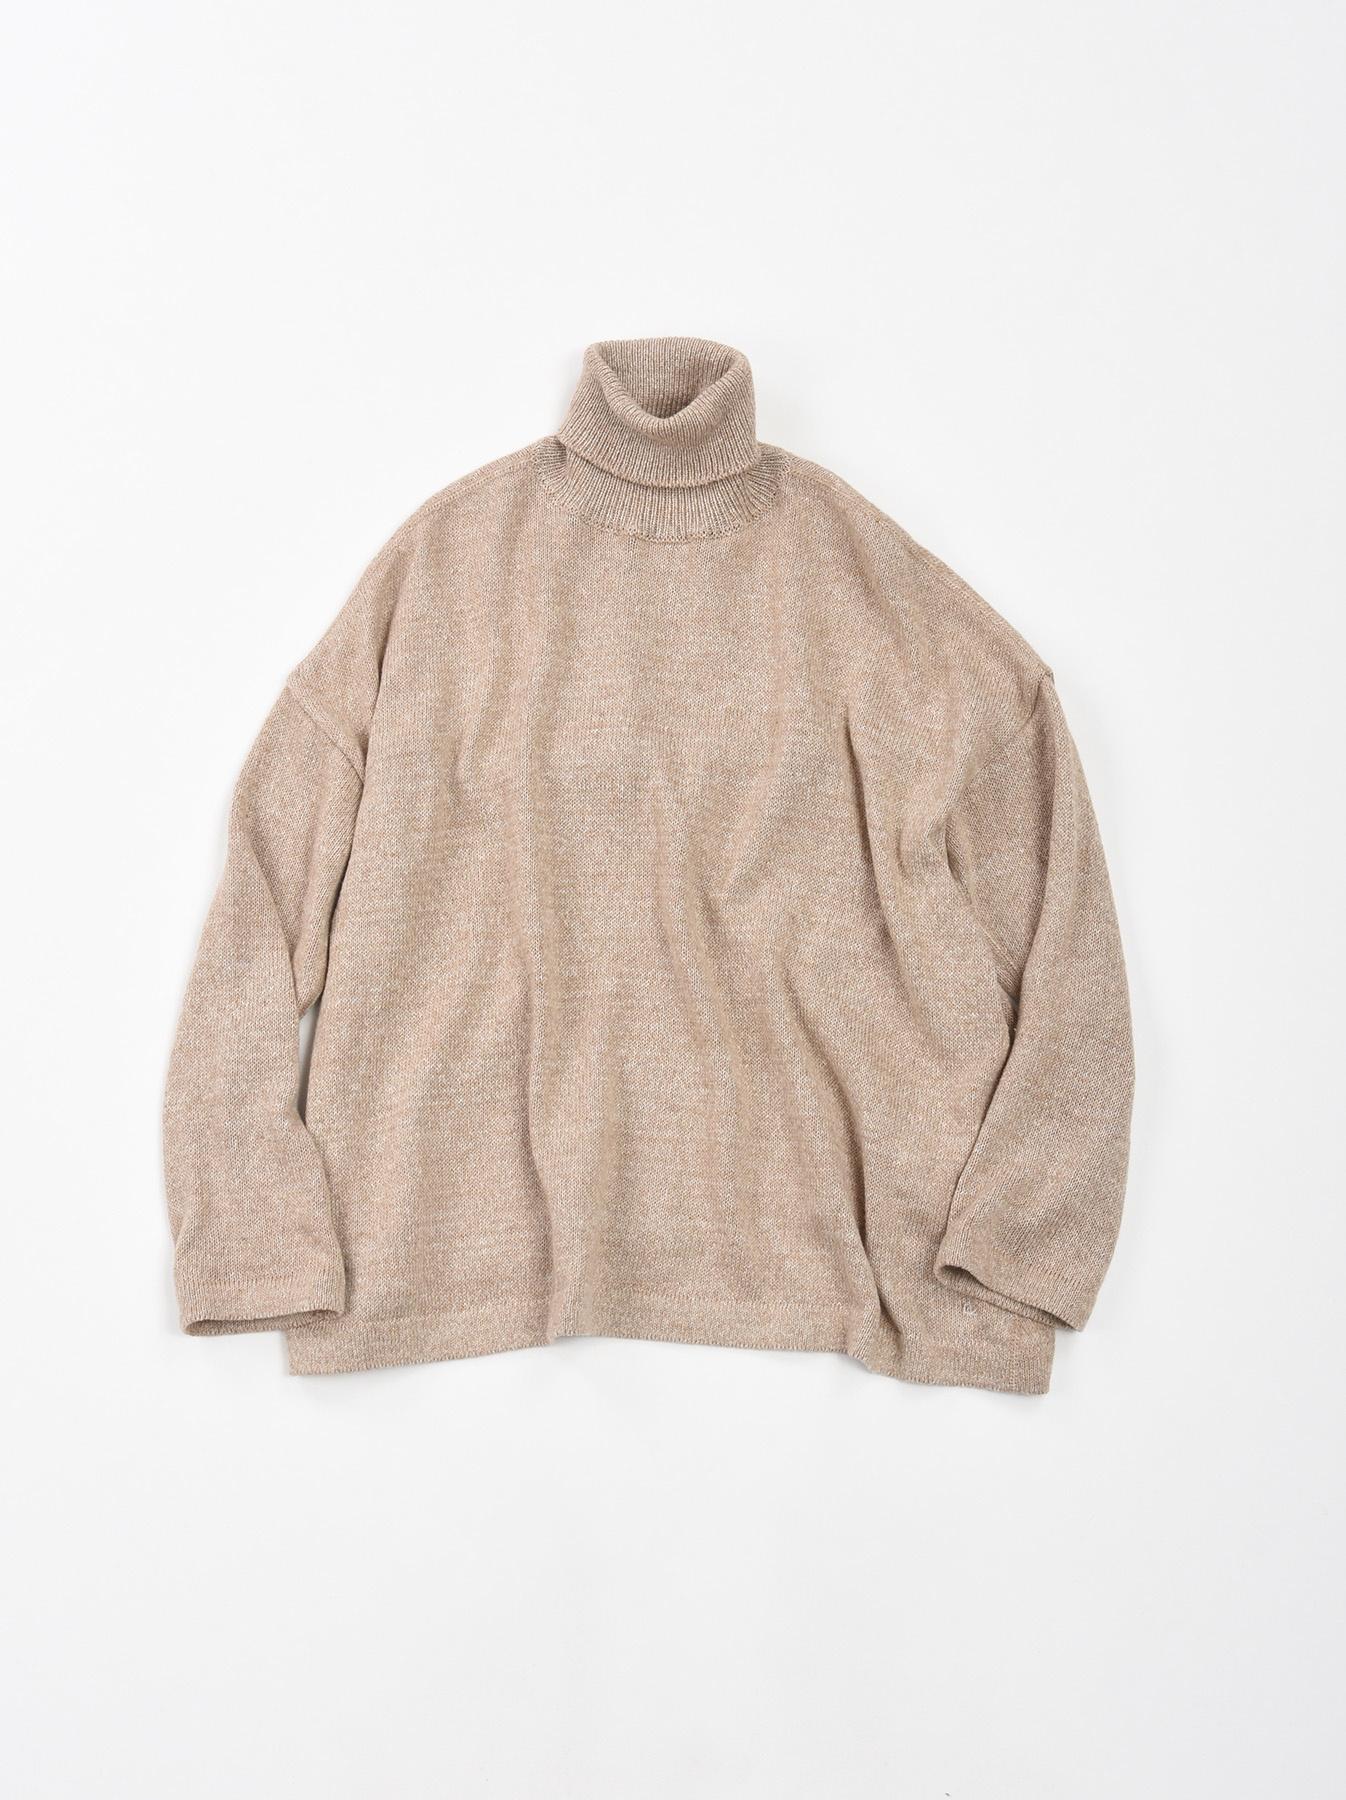 Zimbabwe Cotton Knit-sew Turtleneck-6